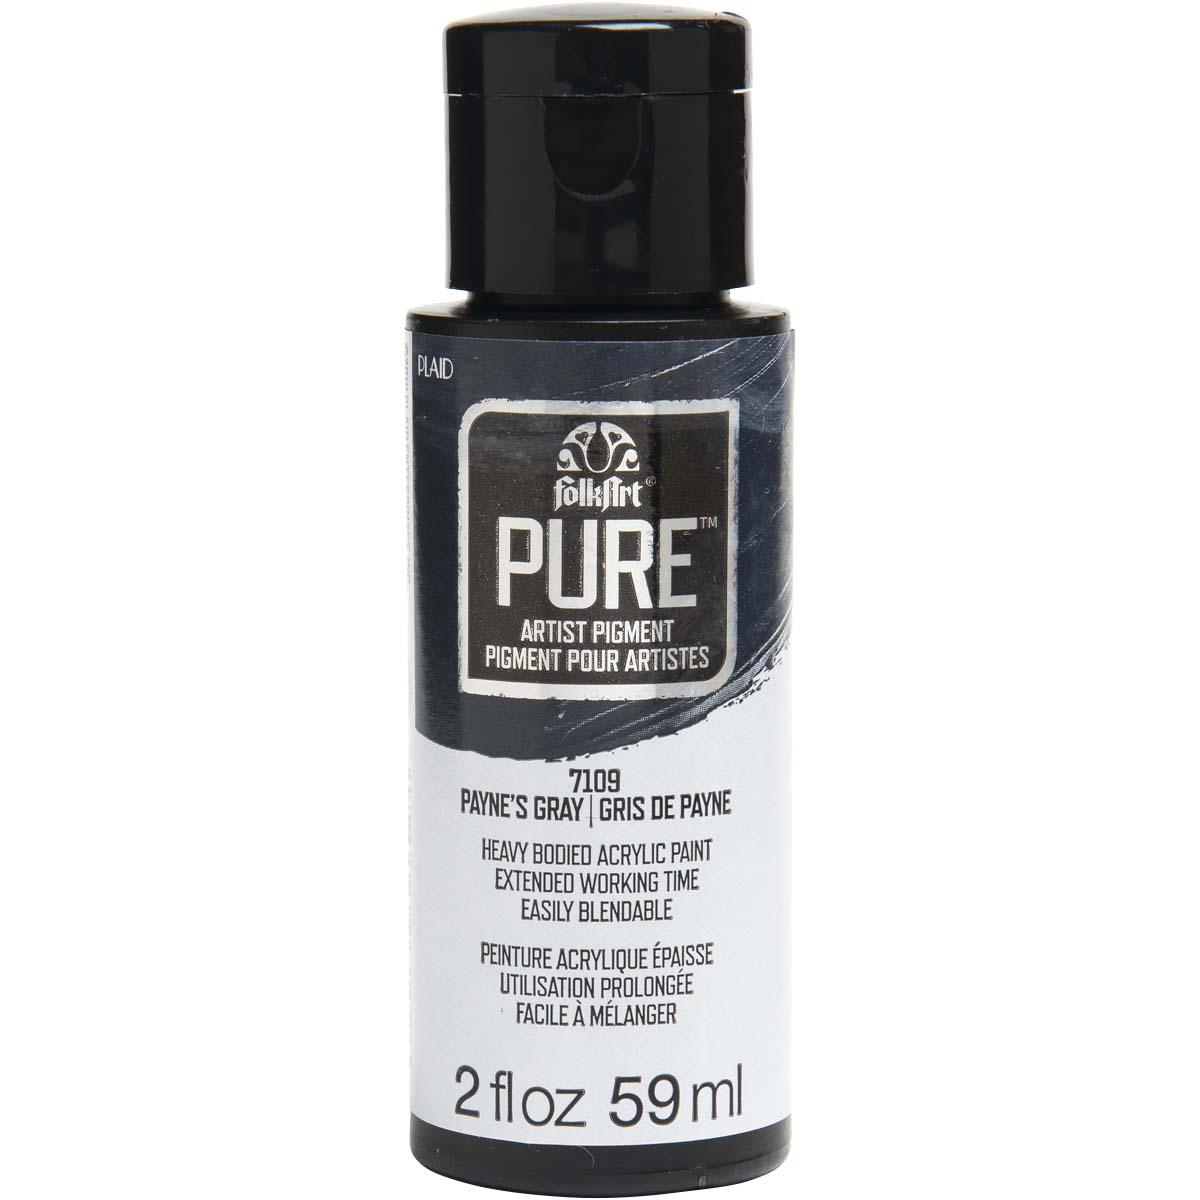 FolkArt ® Pure™ Artist Pigment - Payne's Gray, 2 oz. - 7109